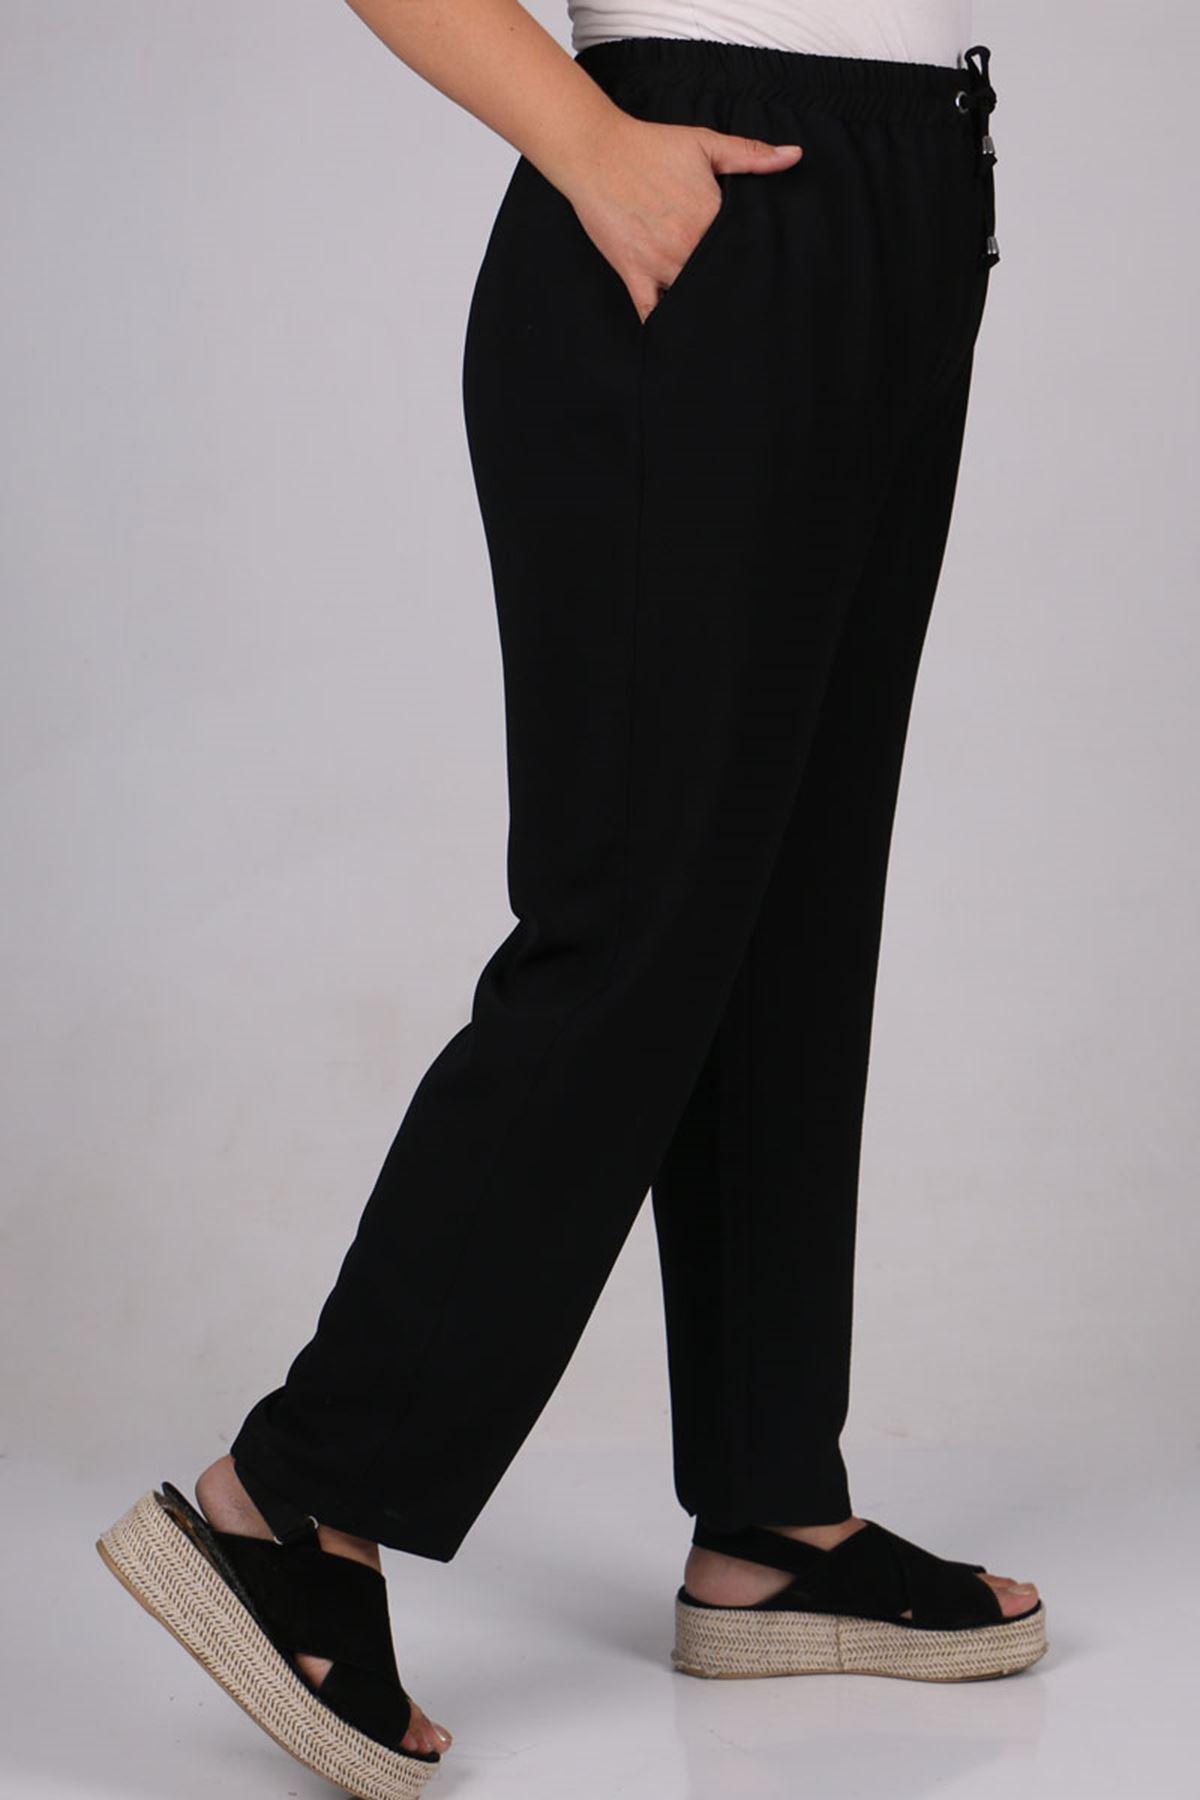 9169 Büyük Beden Lastikli Moskino Dar Paça Pantolon - Siyah